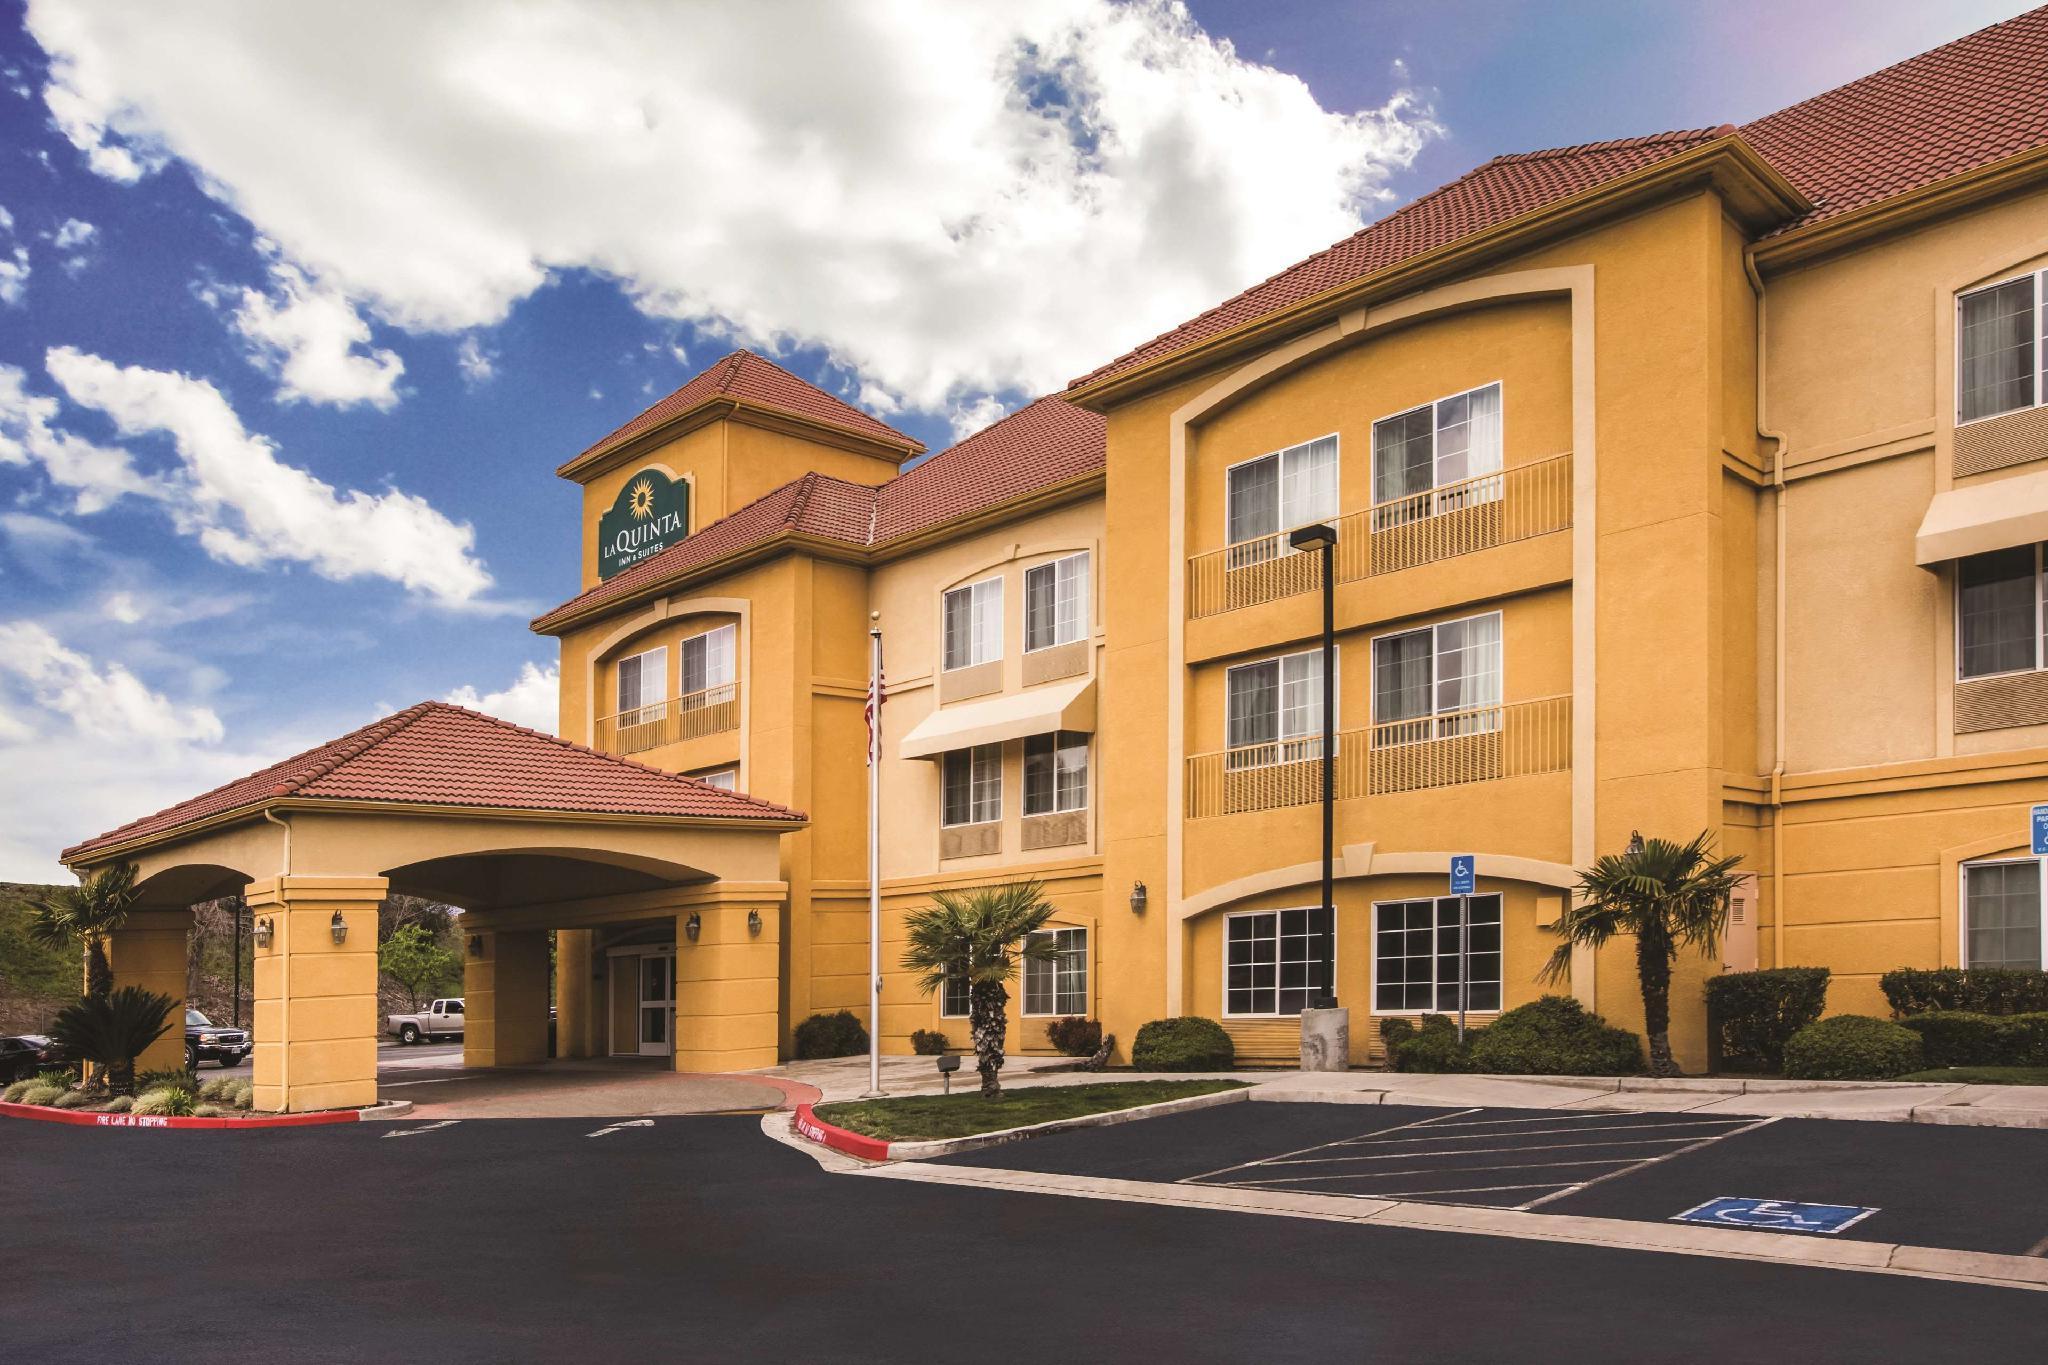 La Quinta Inn And Suites By Wyndham Manteca   Ripon